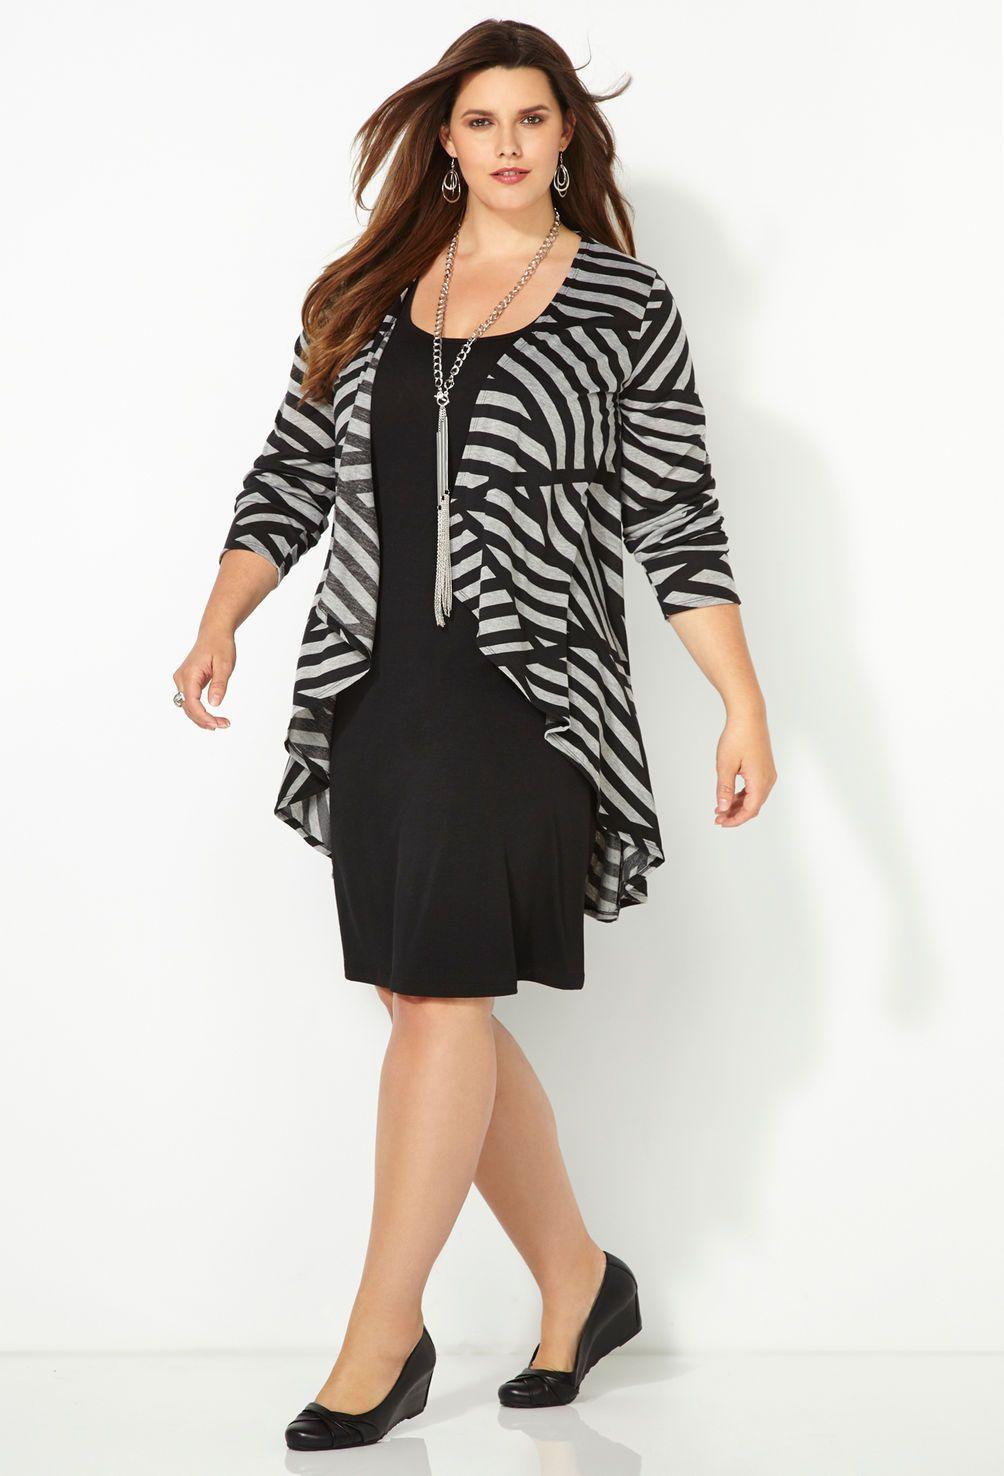 Grey Striped Jacket Dress Plus Size Jacket Dress Avenue Plus Size Outfits Plus Size Fashion Fashion [ 1476 x 1004 Pixel ]